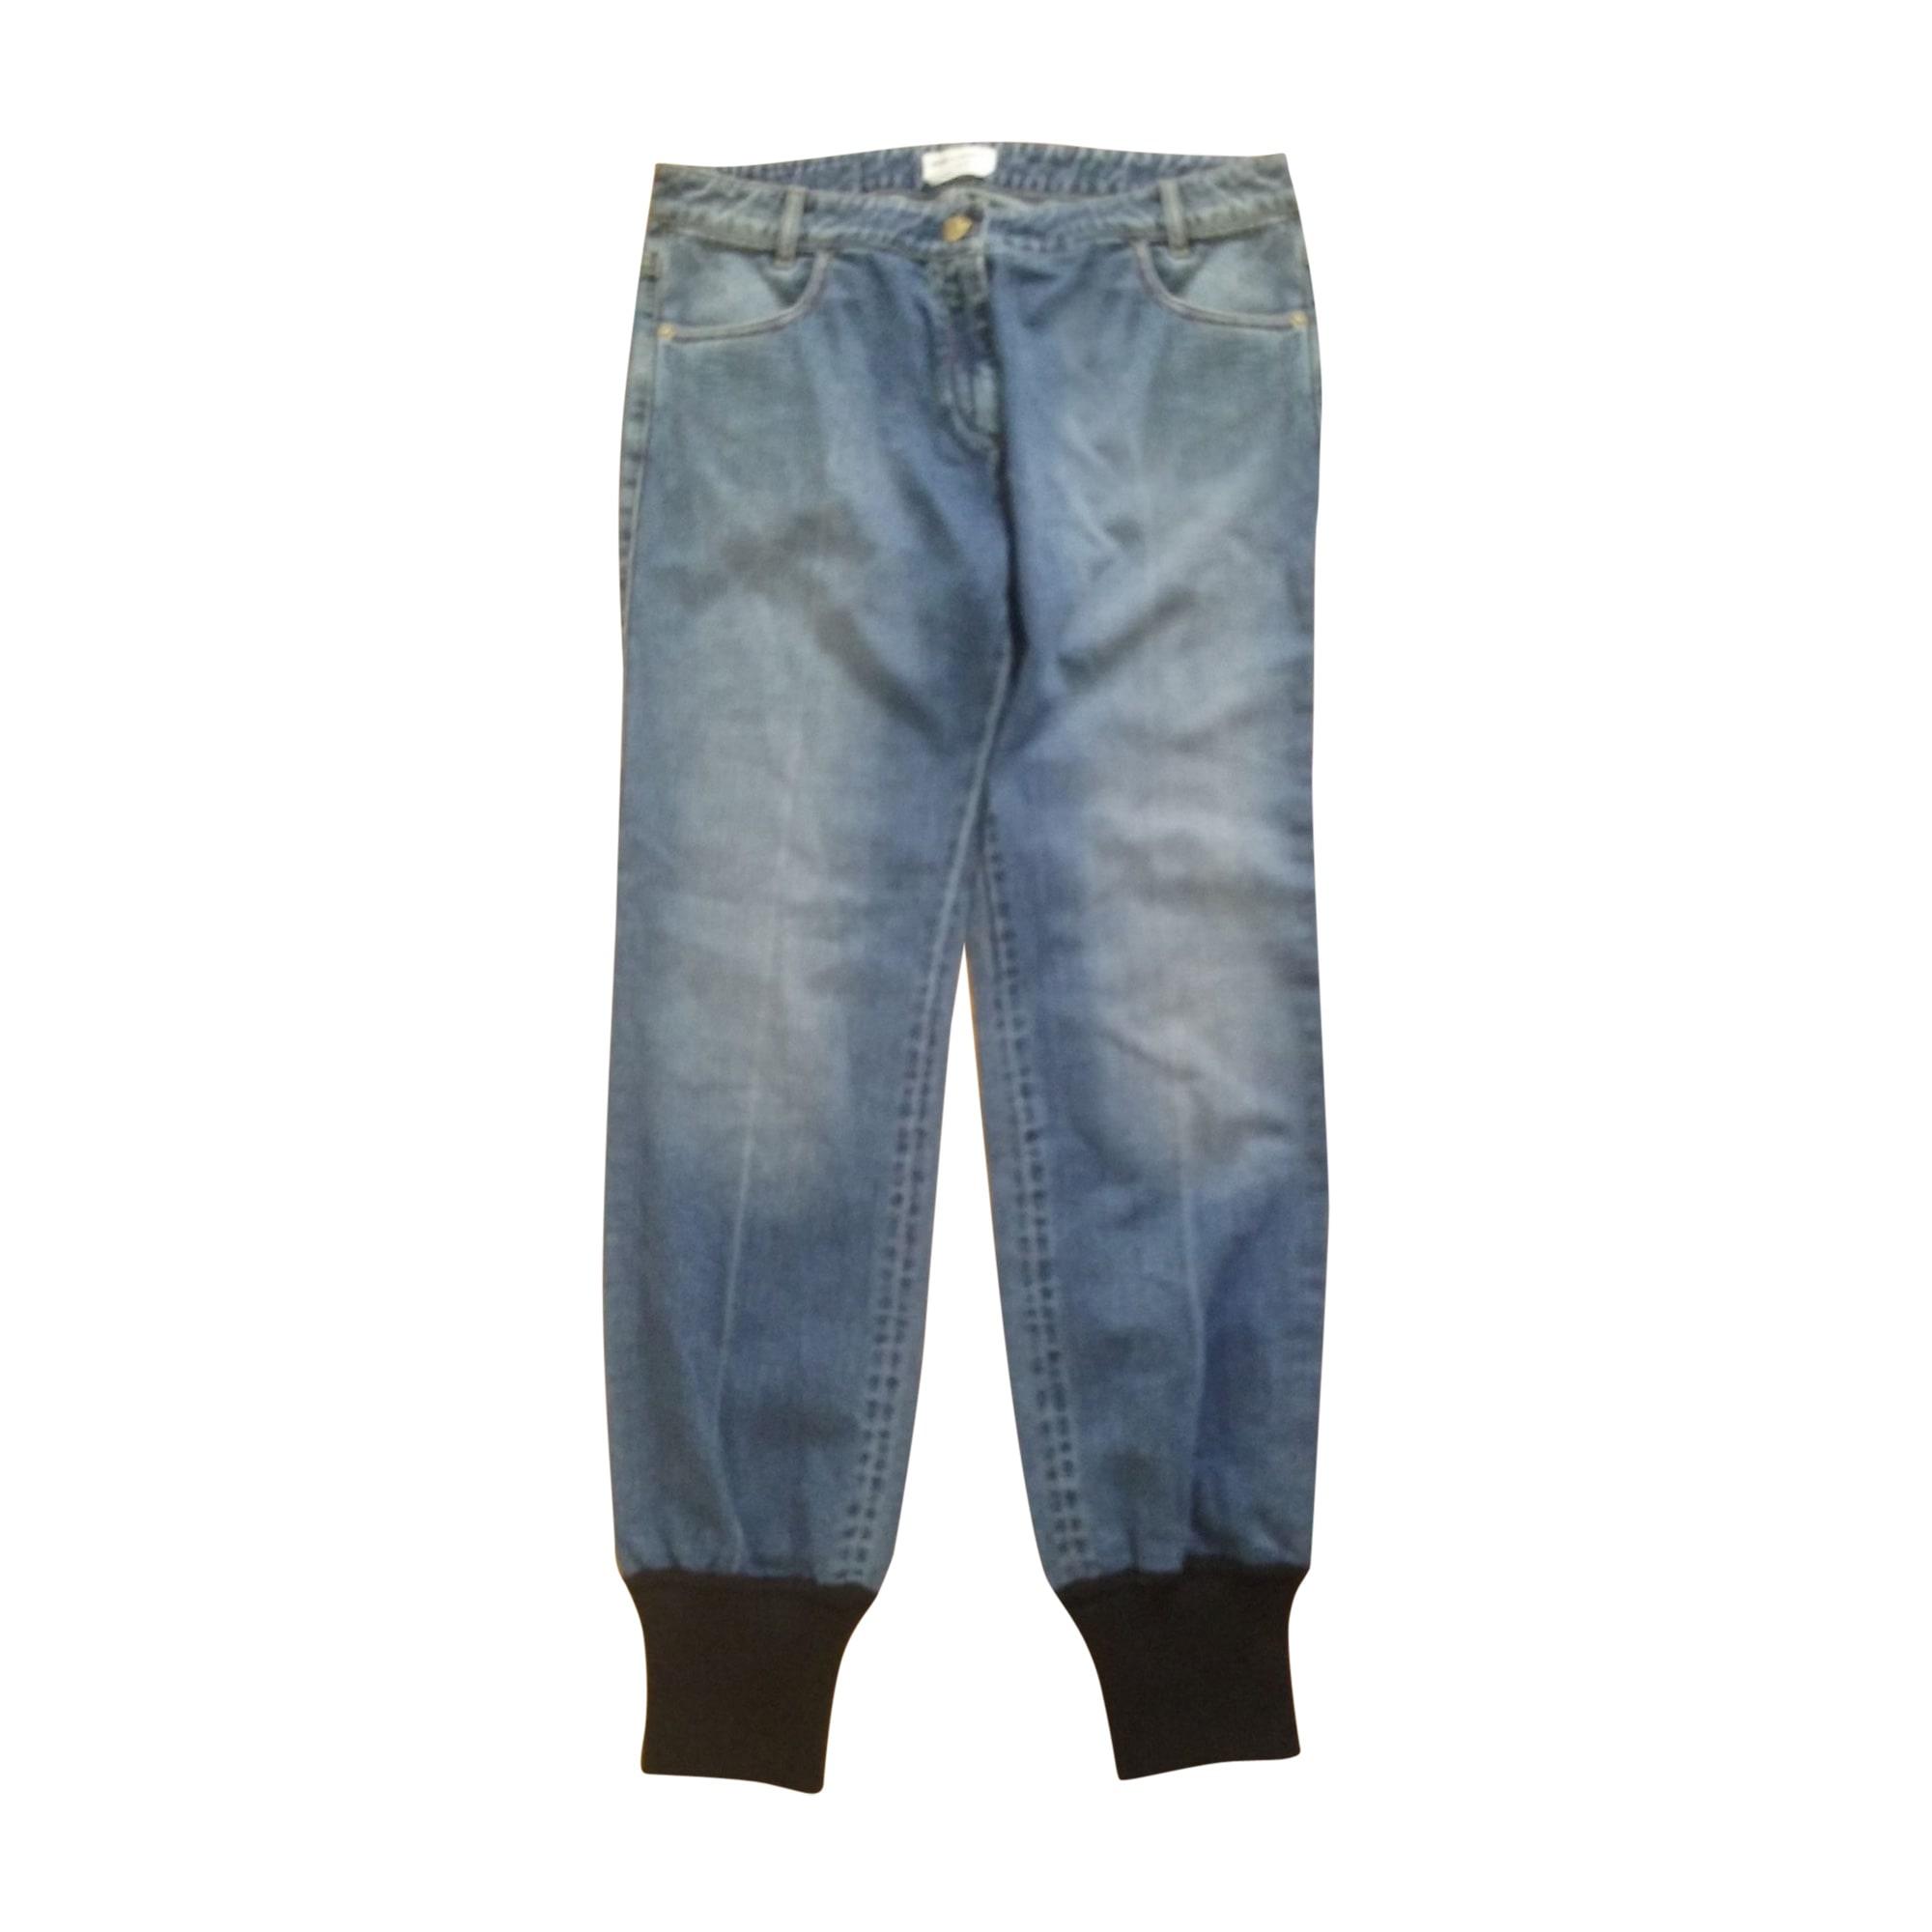 Jeans droit SONIA RYKIEL Bleu, bleu marine, bleu turquoise